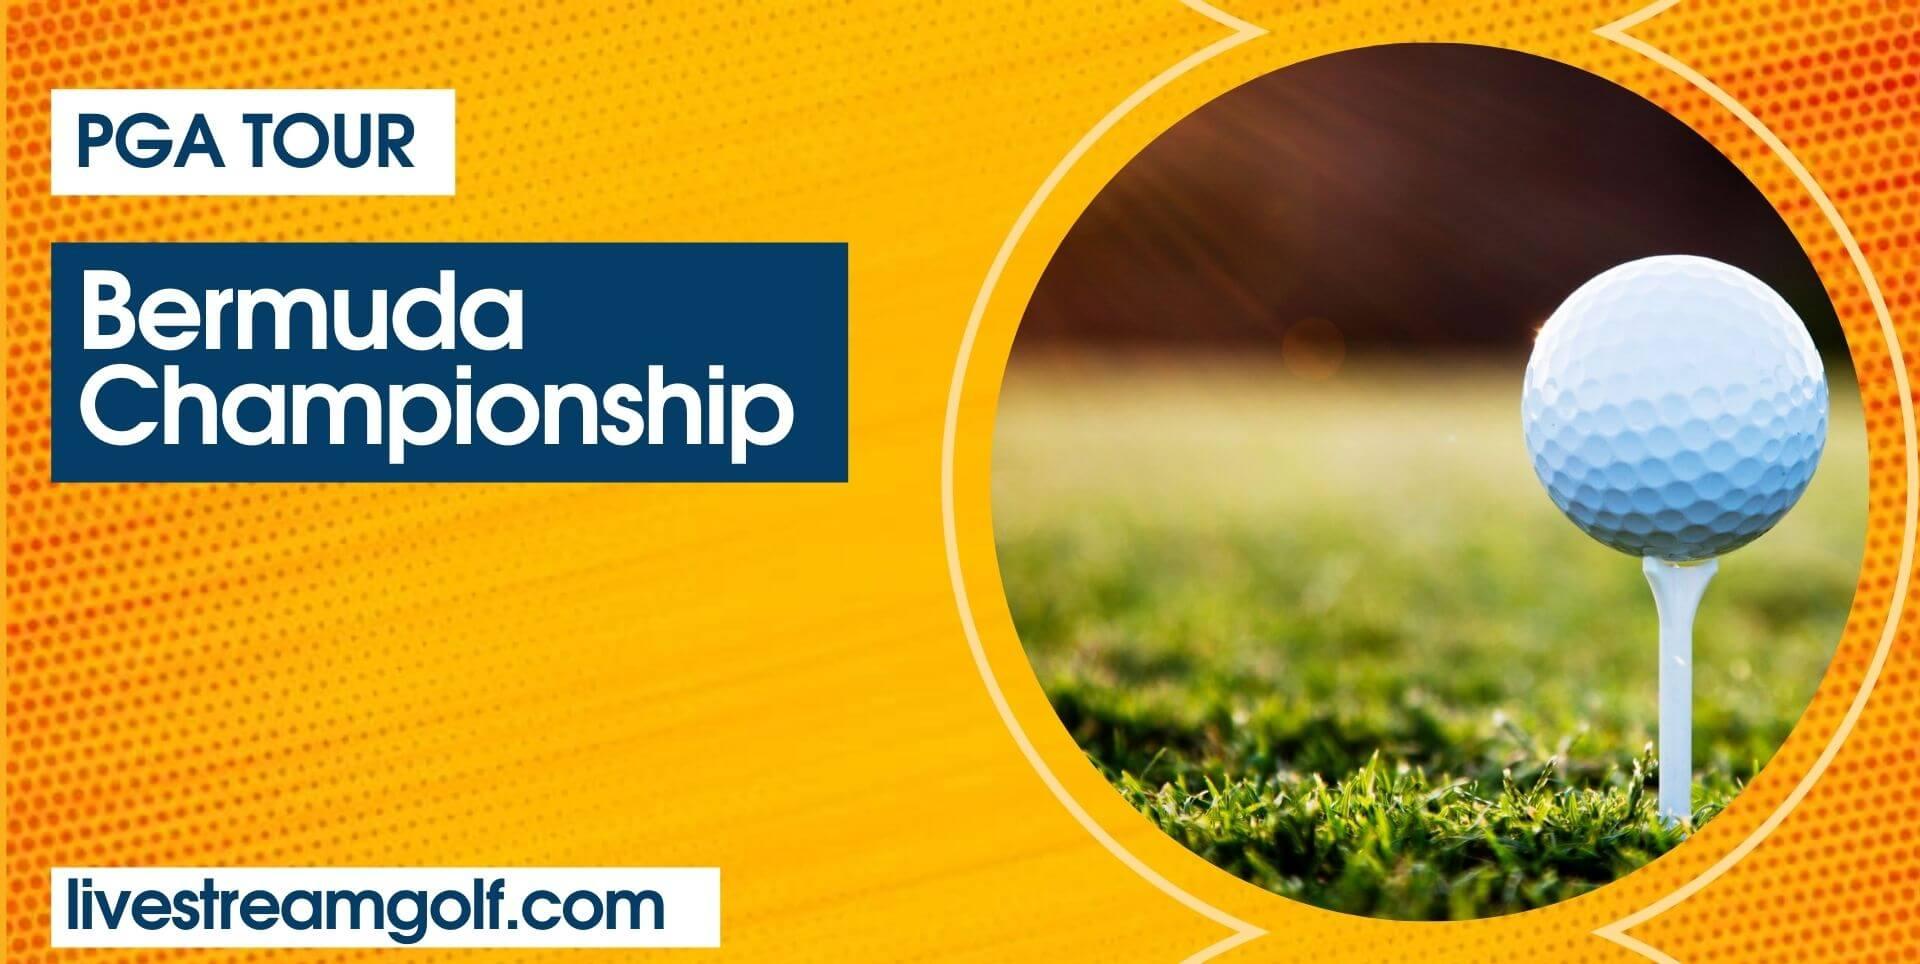 Bermuda Championship Rd 1 Live Stream: PGA Tour 2021